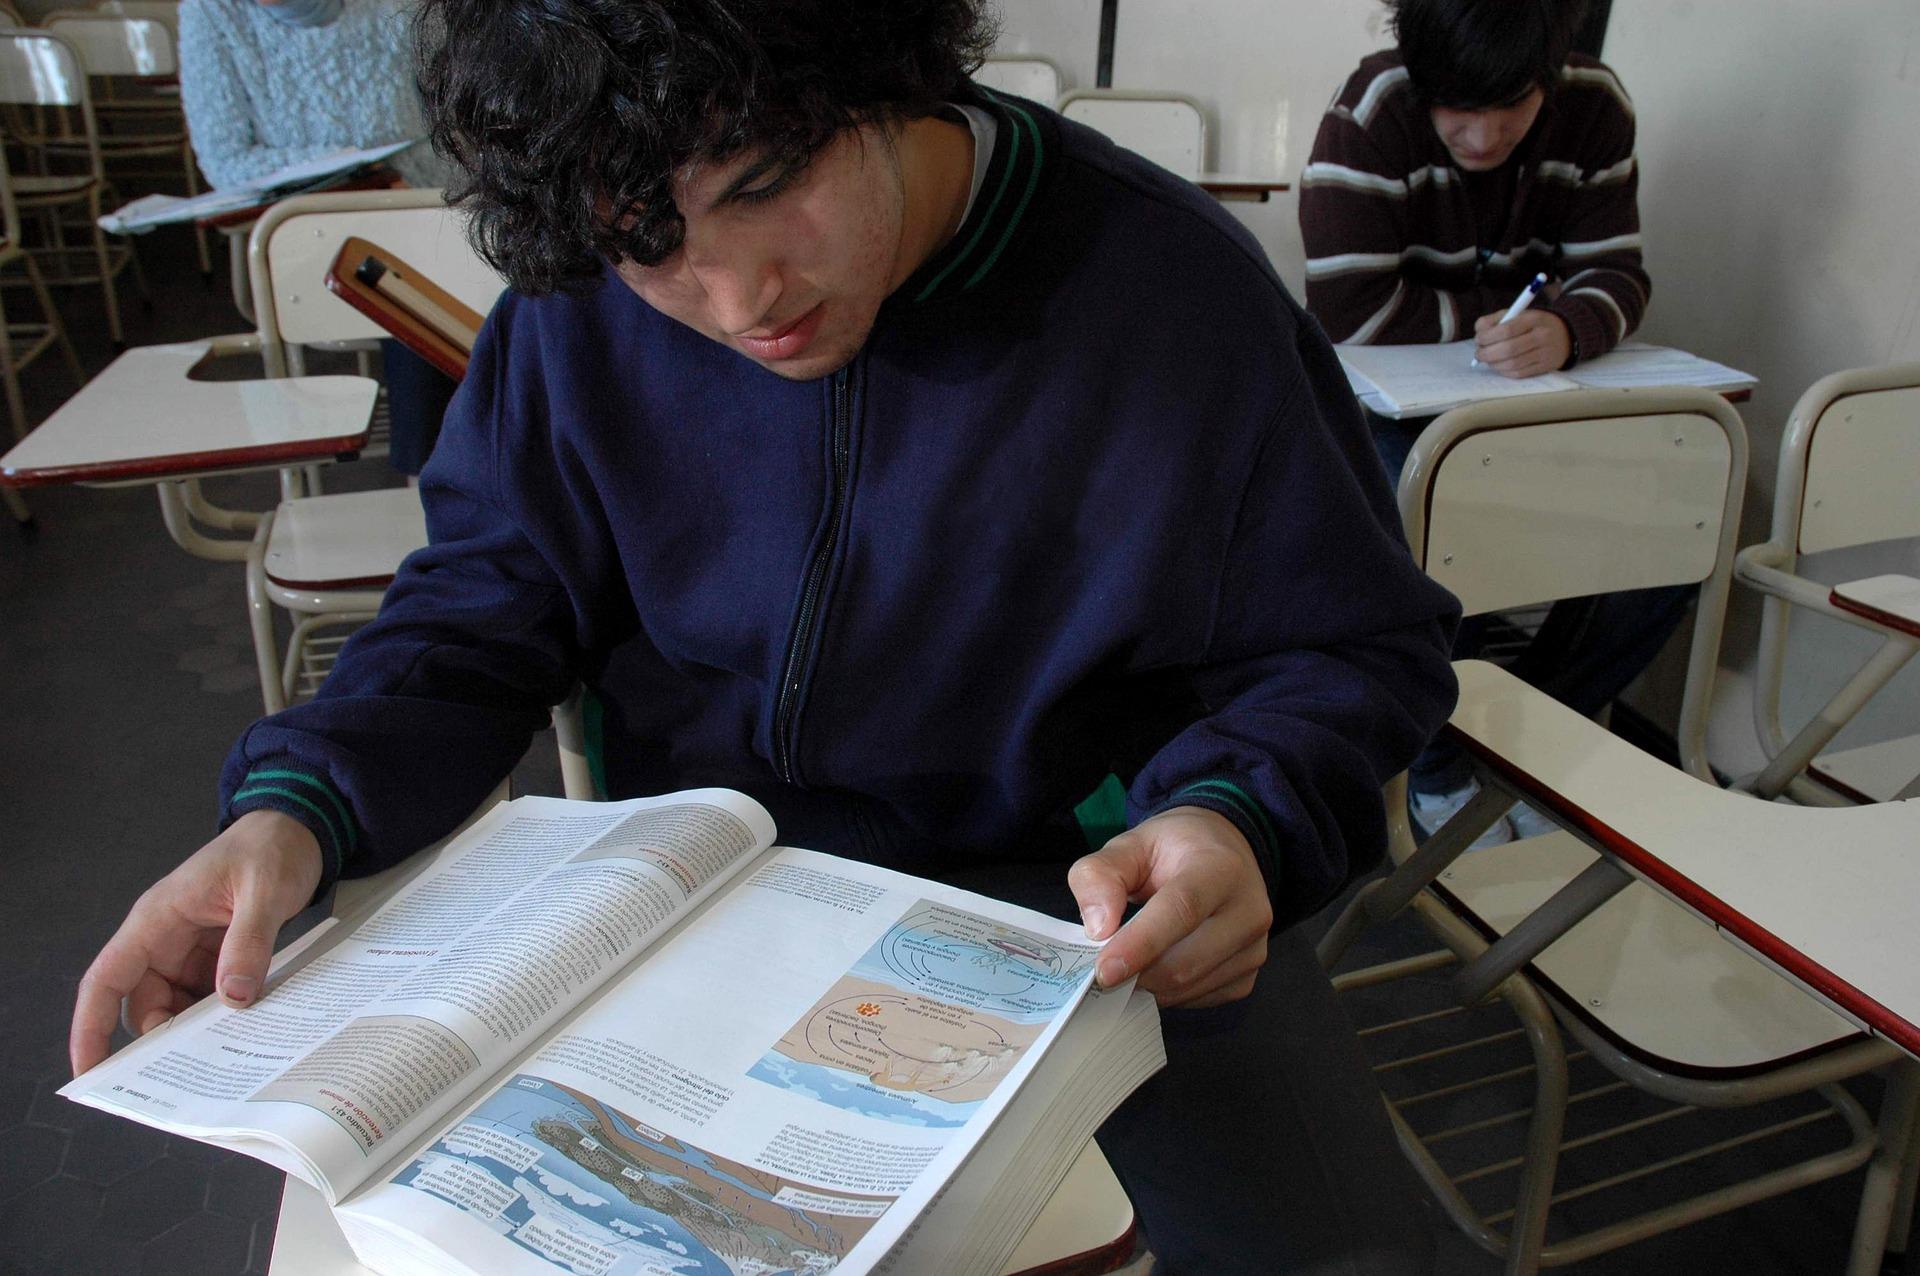 classroom-732016_1920